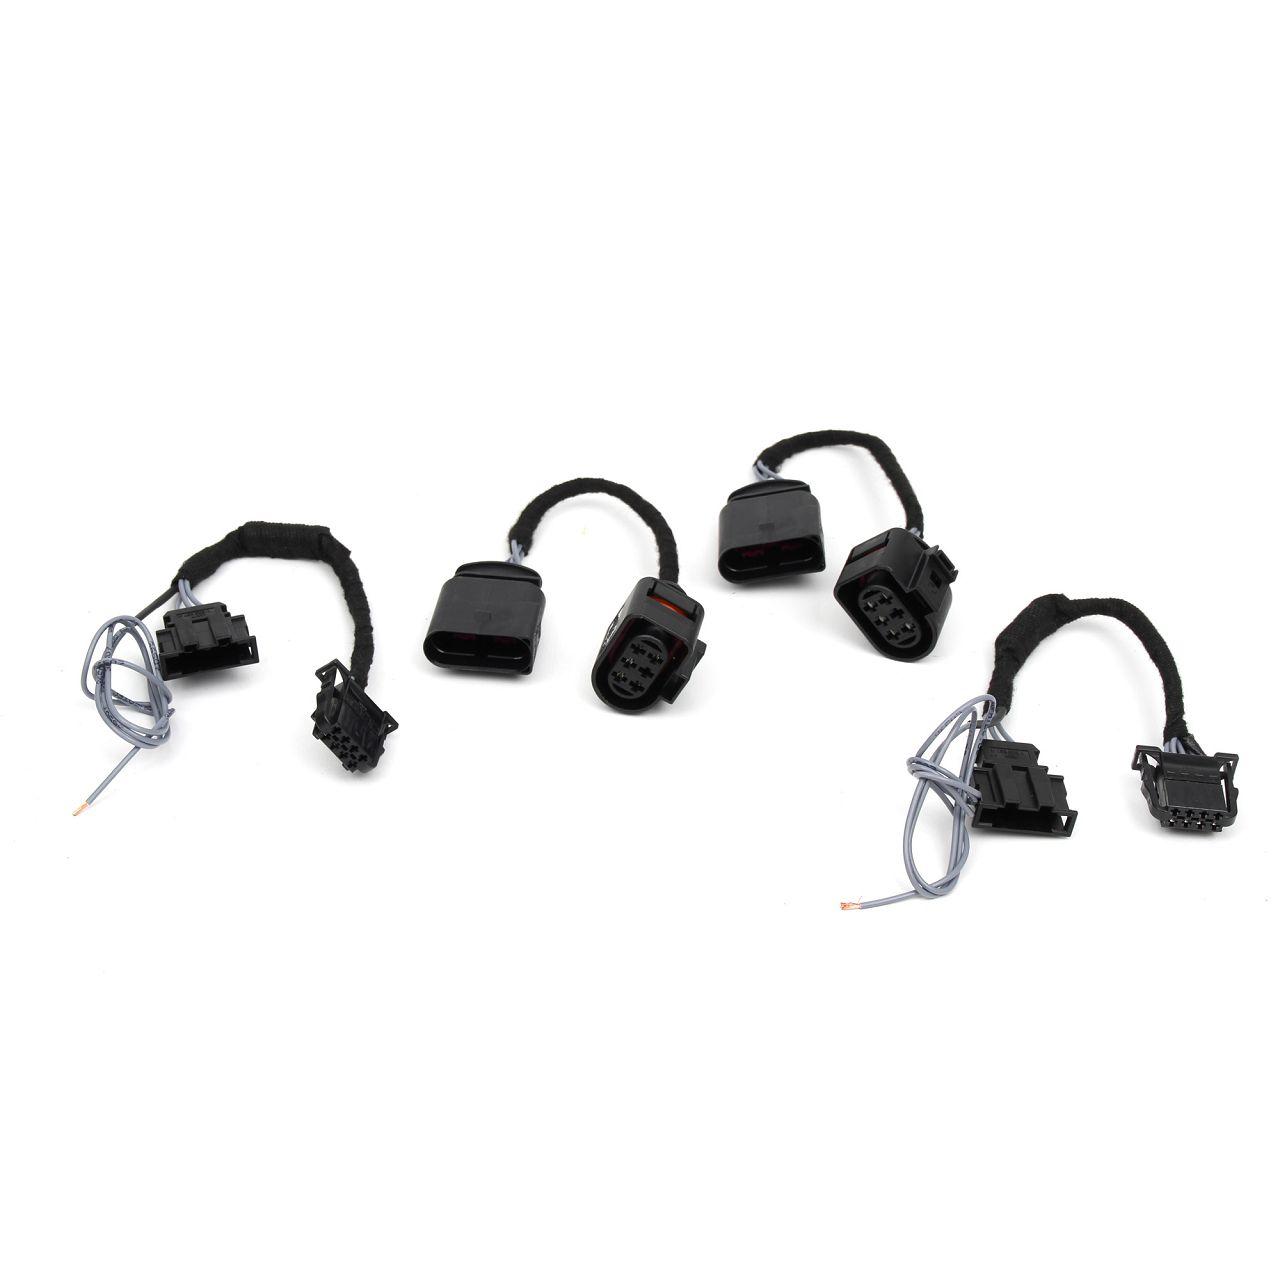 MAGNETI MARELLI Heckleuchten LED für AUDI A3 S3 RS3 (8PA) Sportback + Adapter